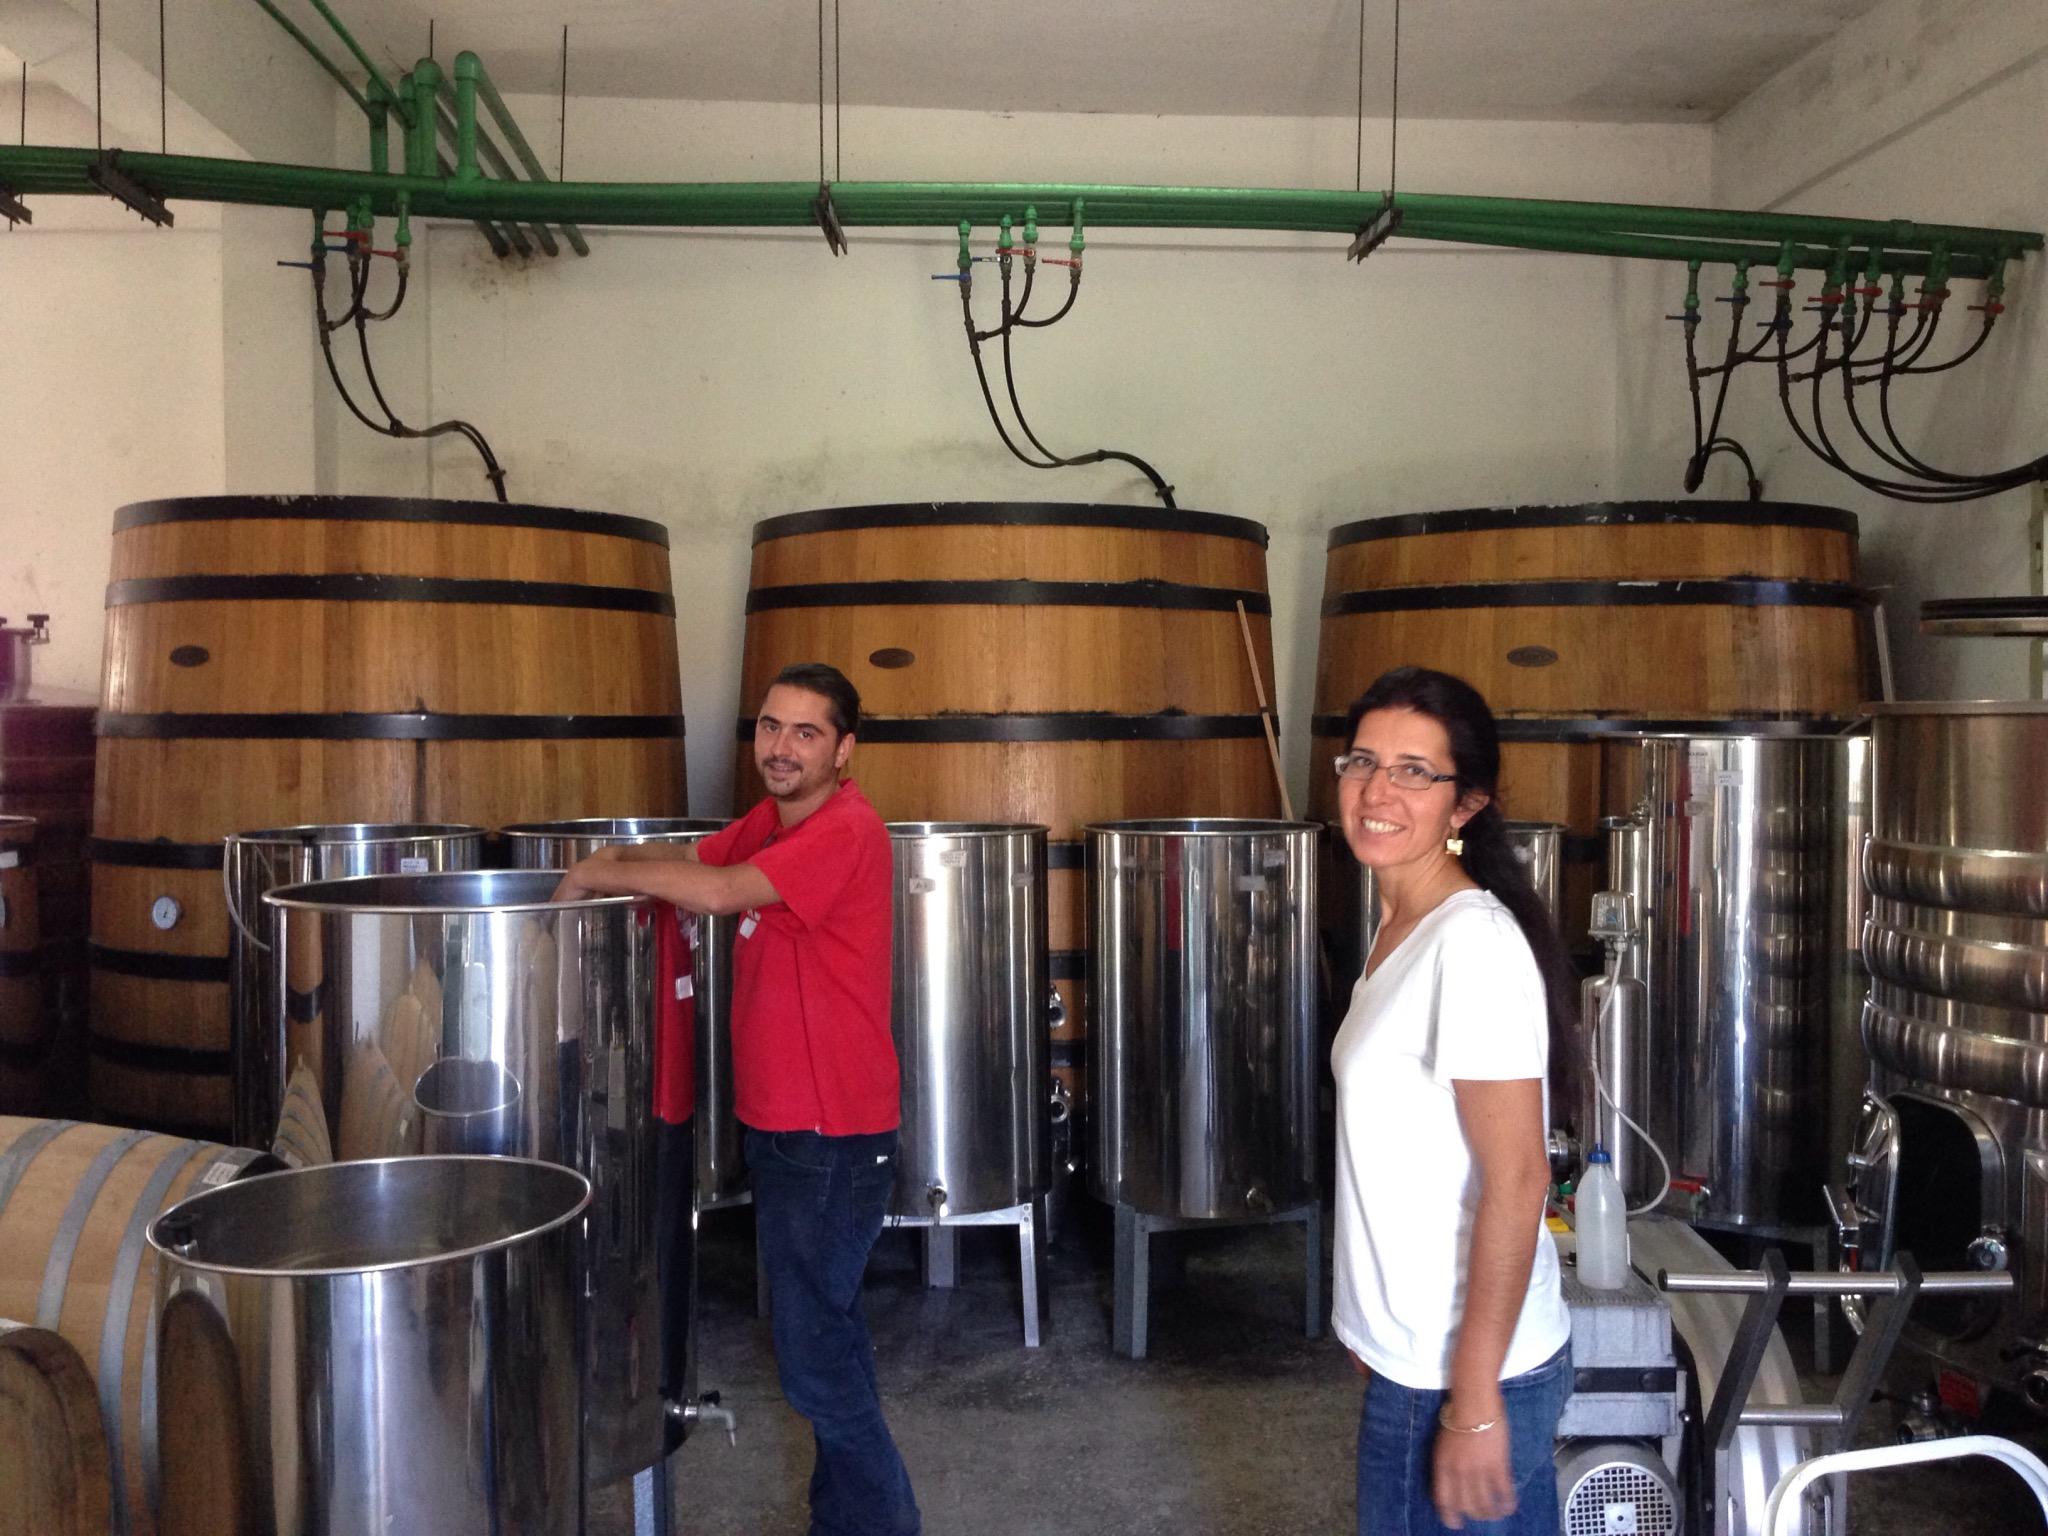 Winemakers Spyros Zoumboulis and Helena Alevra